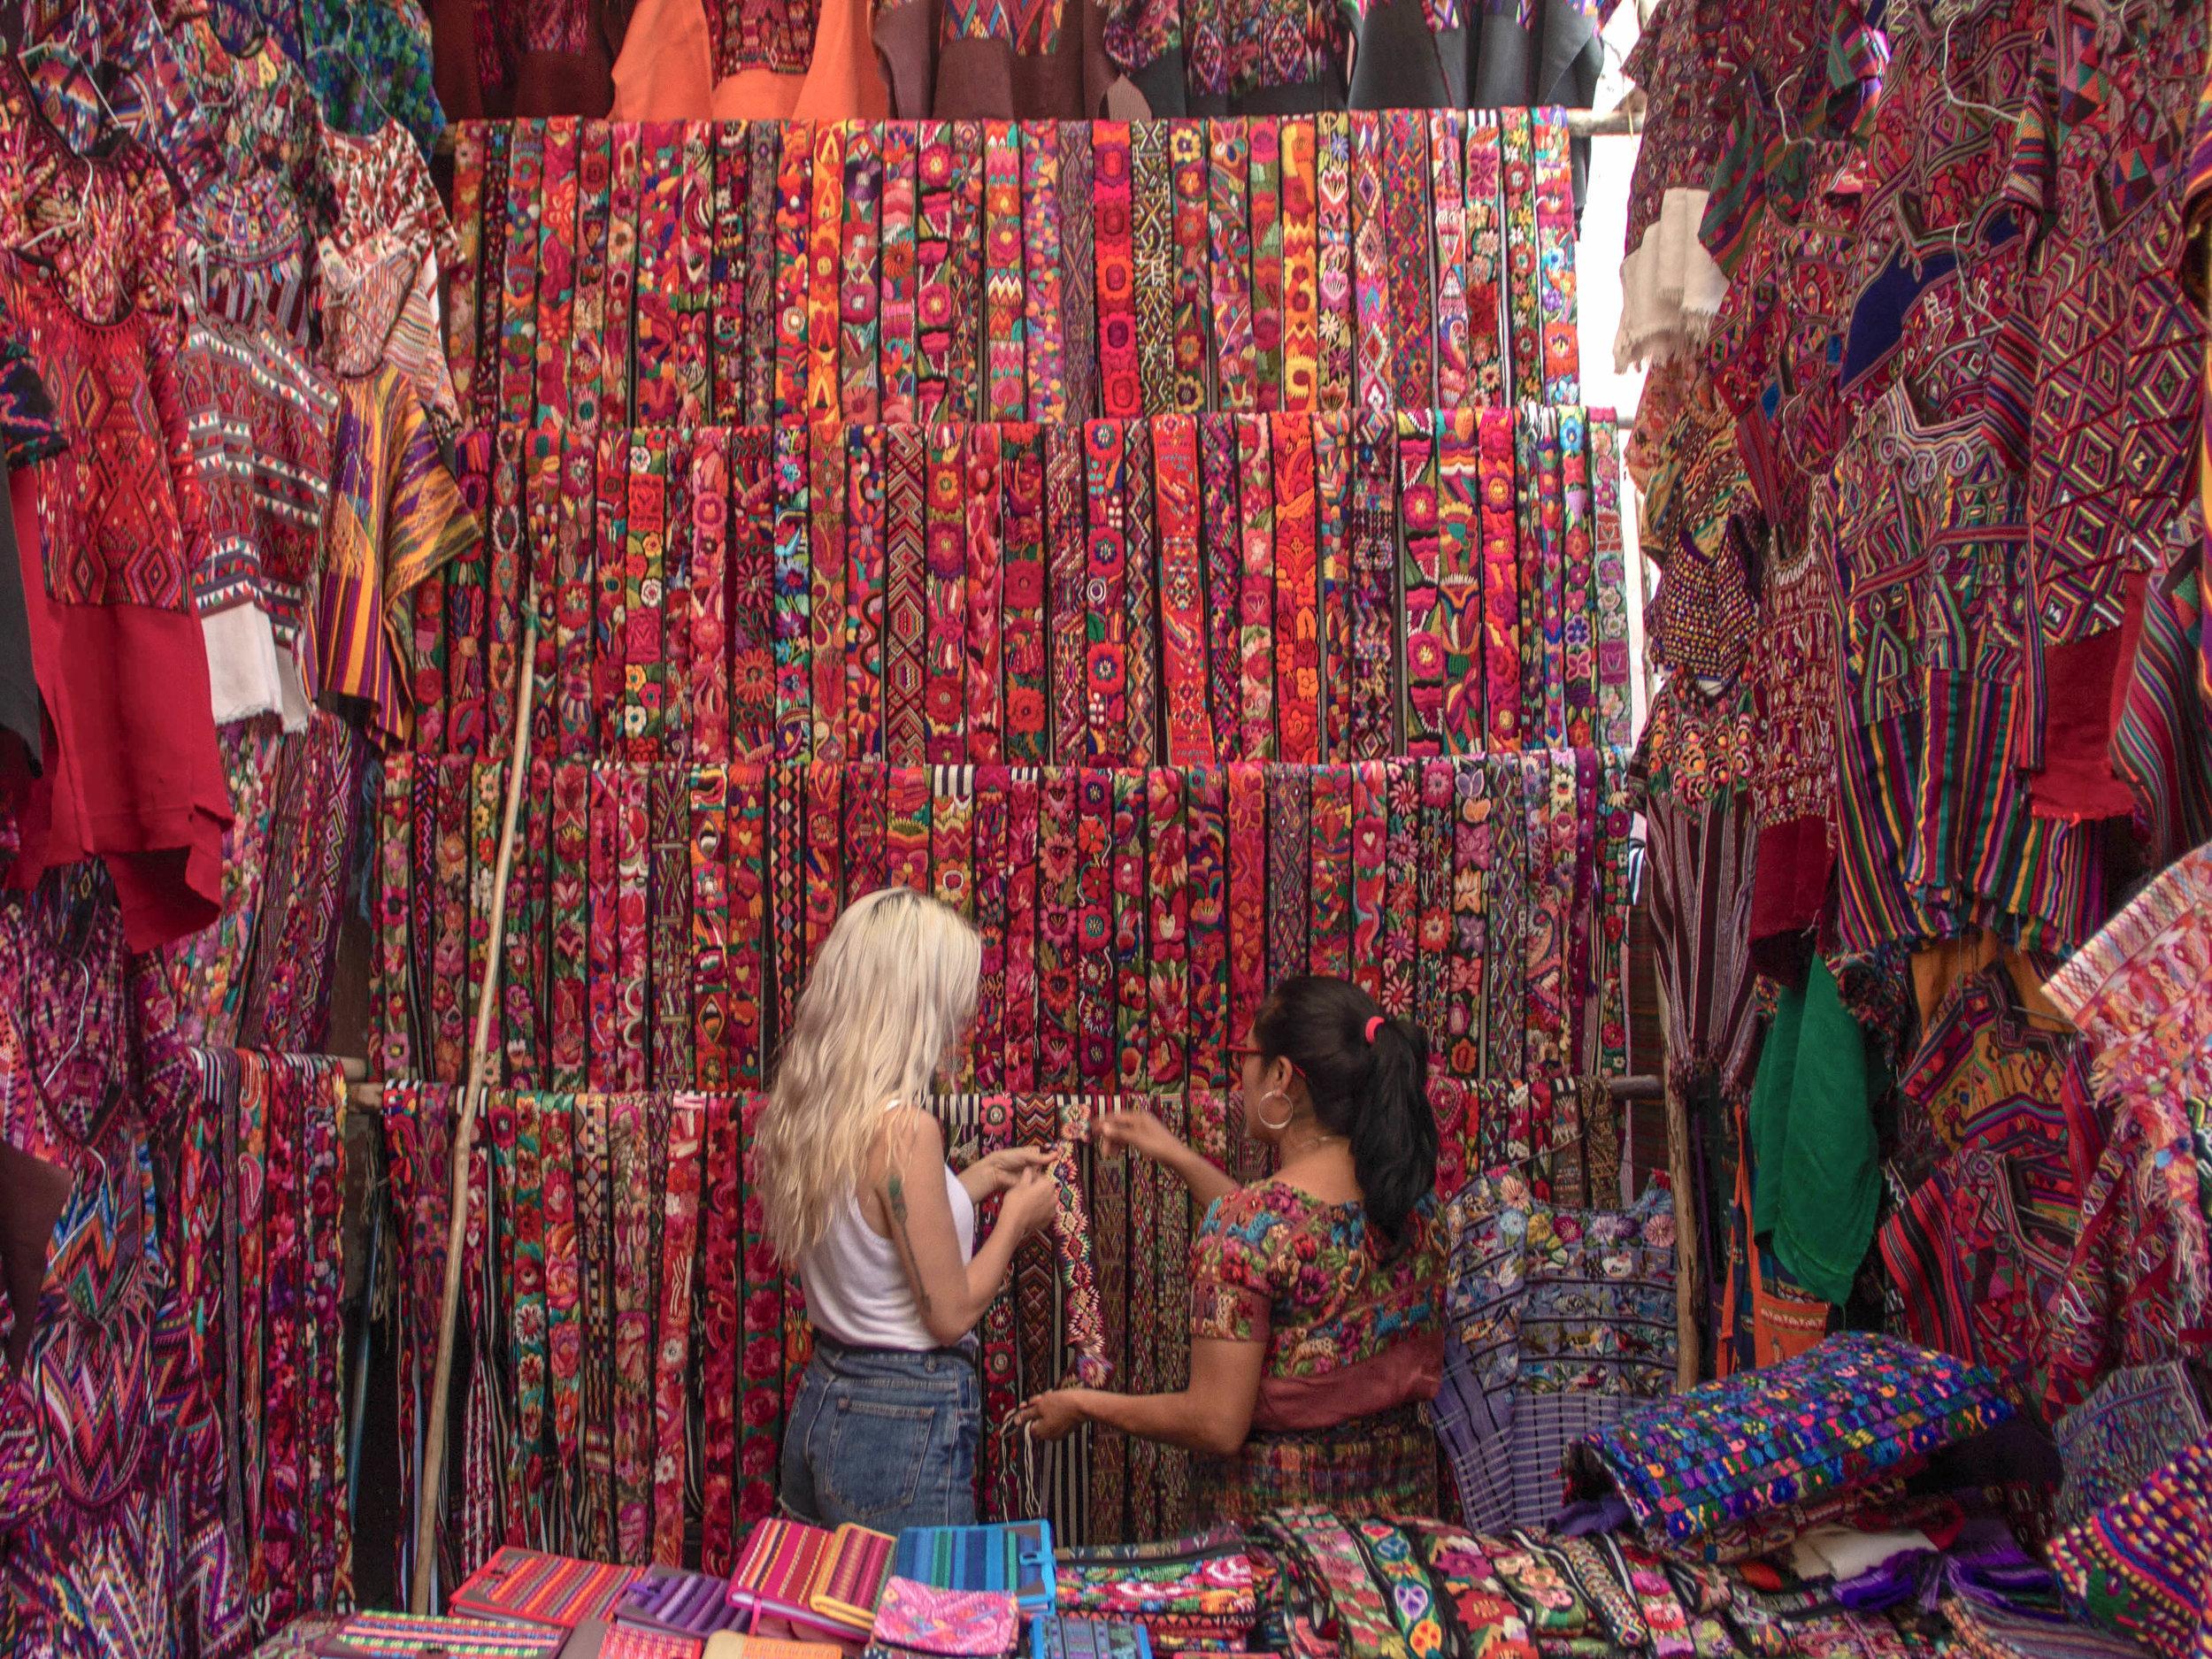 Alyssa and Hiptipico Artisan Director Marleny choose traditional fajas at the Chichicastenango Market in Guatemala